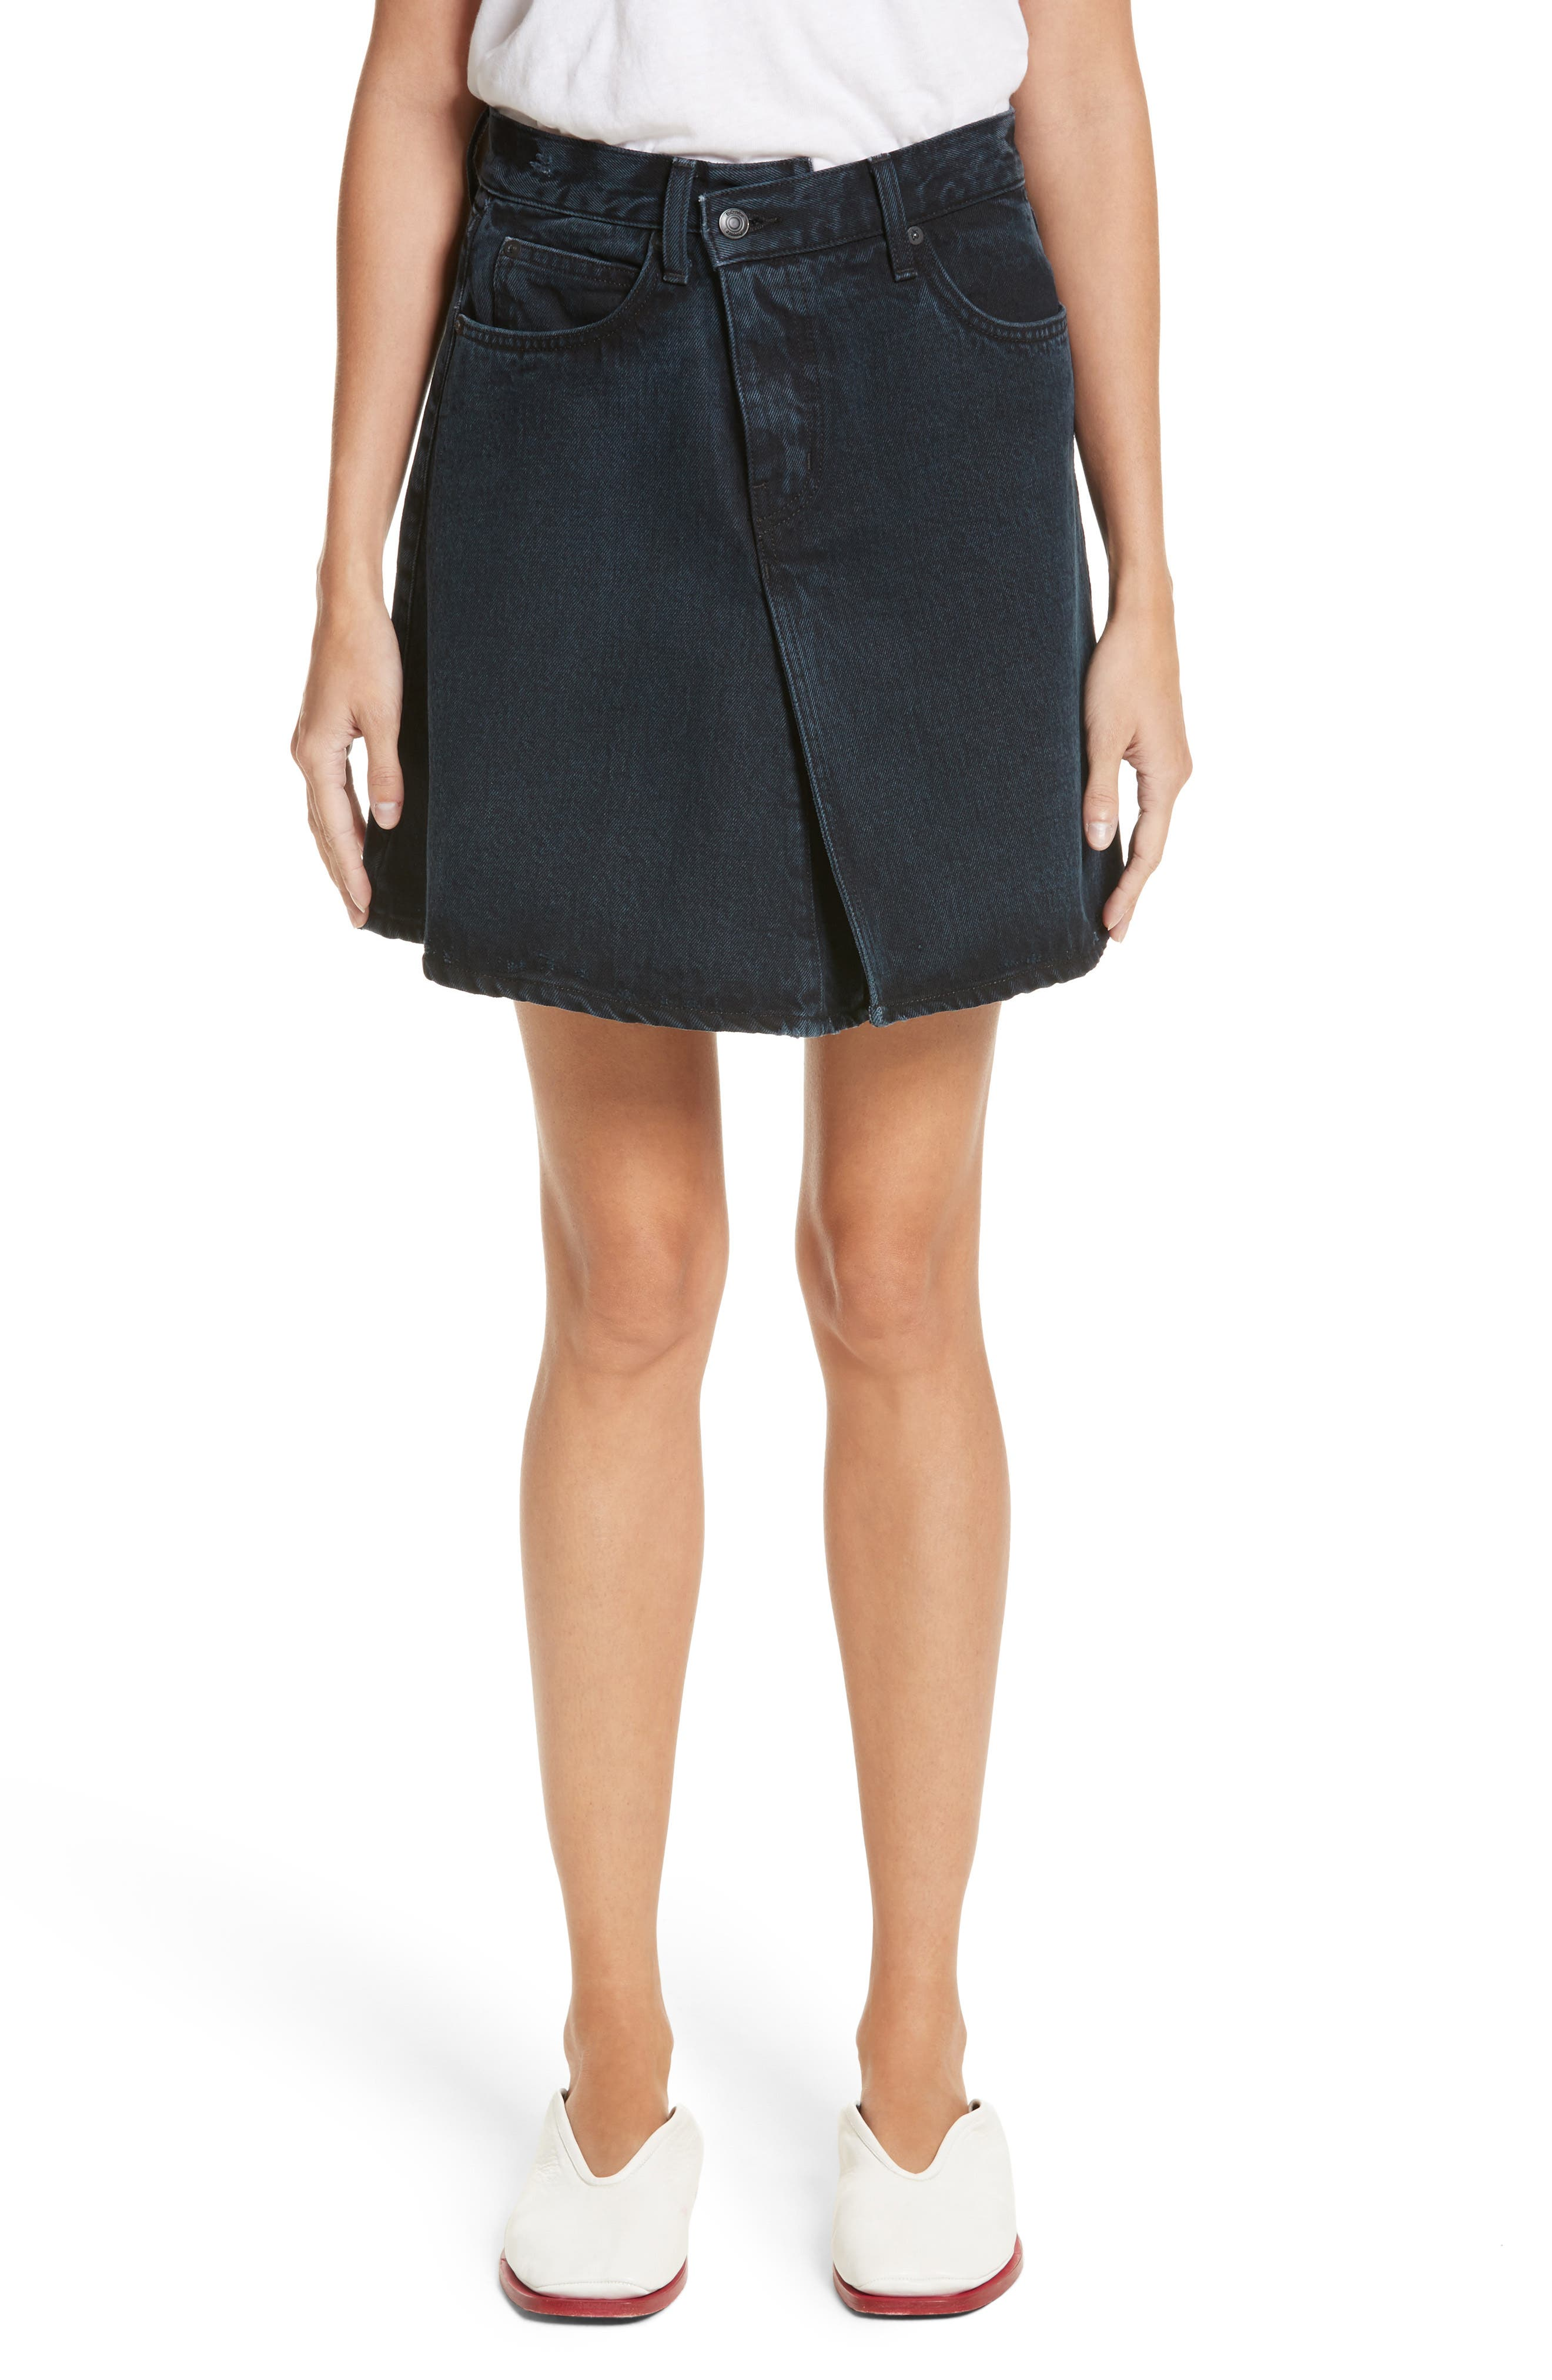 PSWL Folded Denim Skirt,                             Main thumbnail 1, color,                             Stone Washed Black